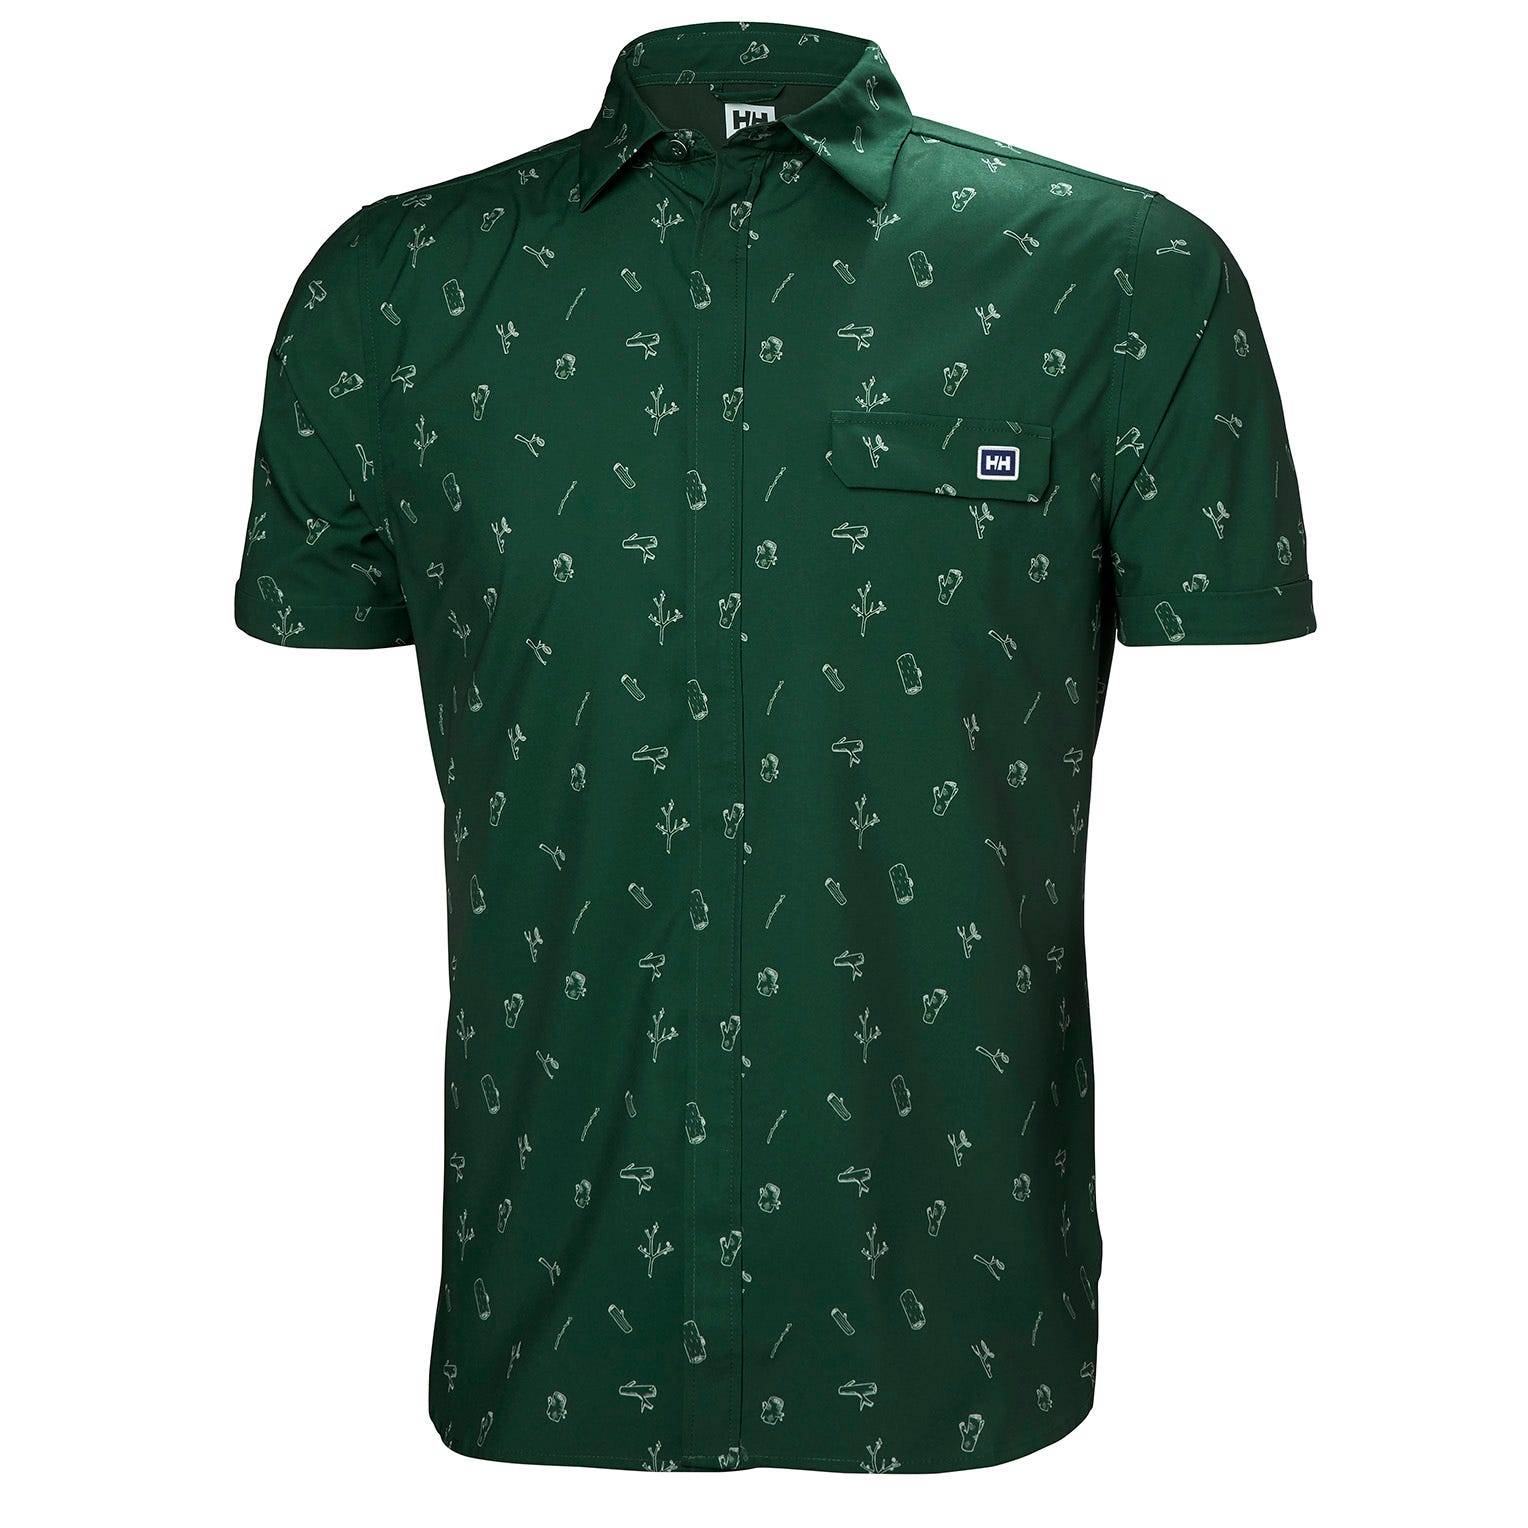 Helly Hansen Oya Shirt Mens Midlayer Green XXL